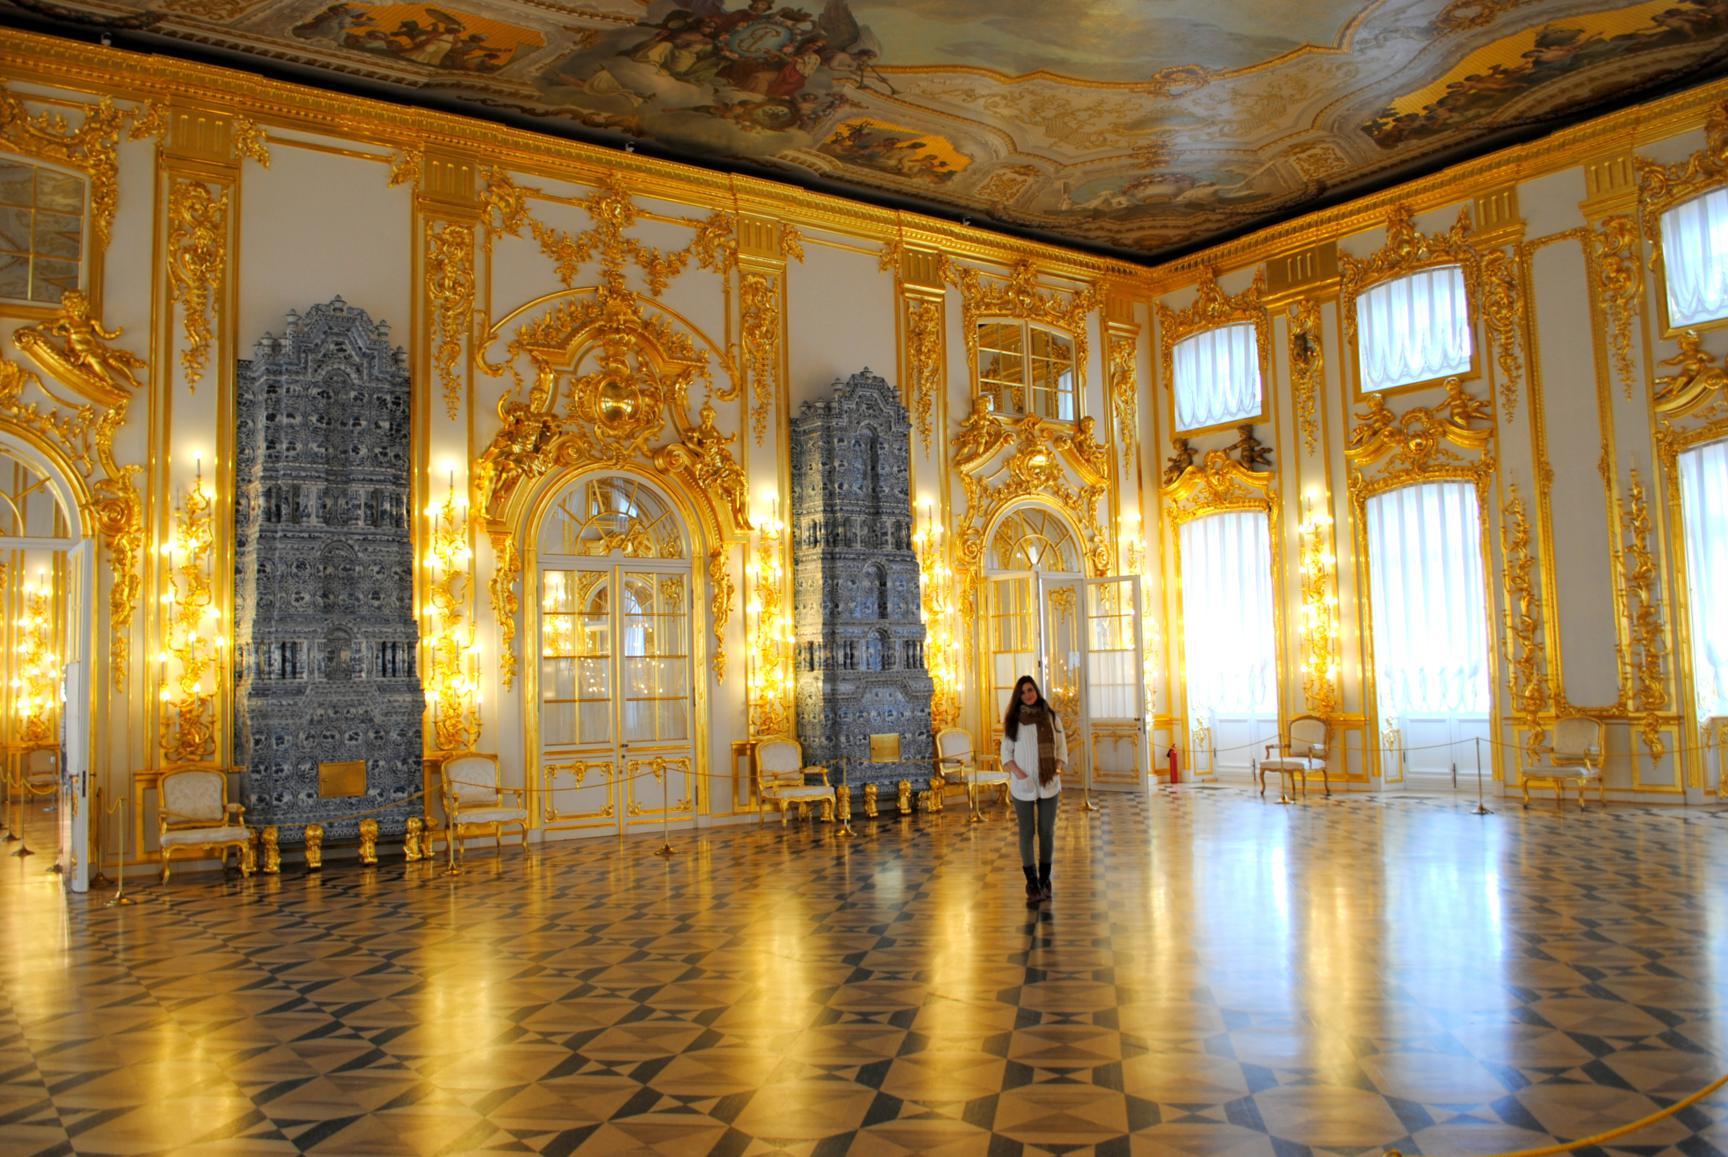 Antecámara y hornos de porcelana holandesa. Palacio de Catalina. Rusia 2015